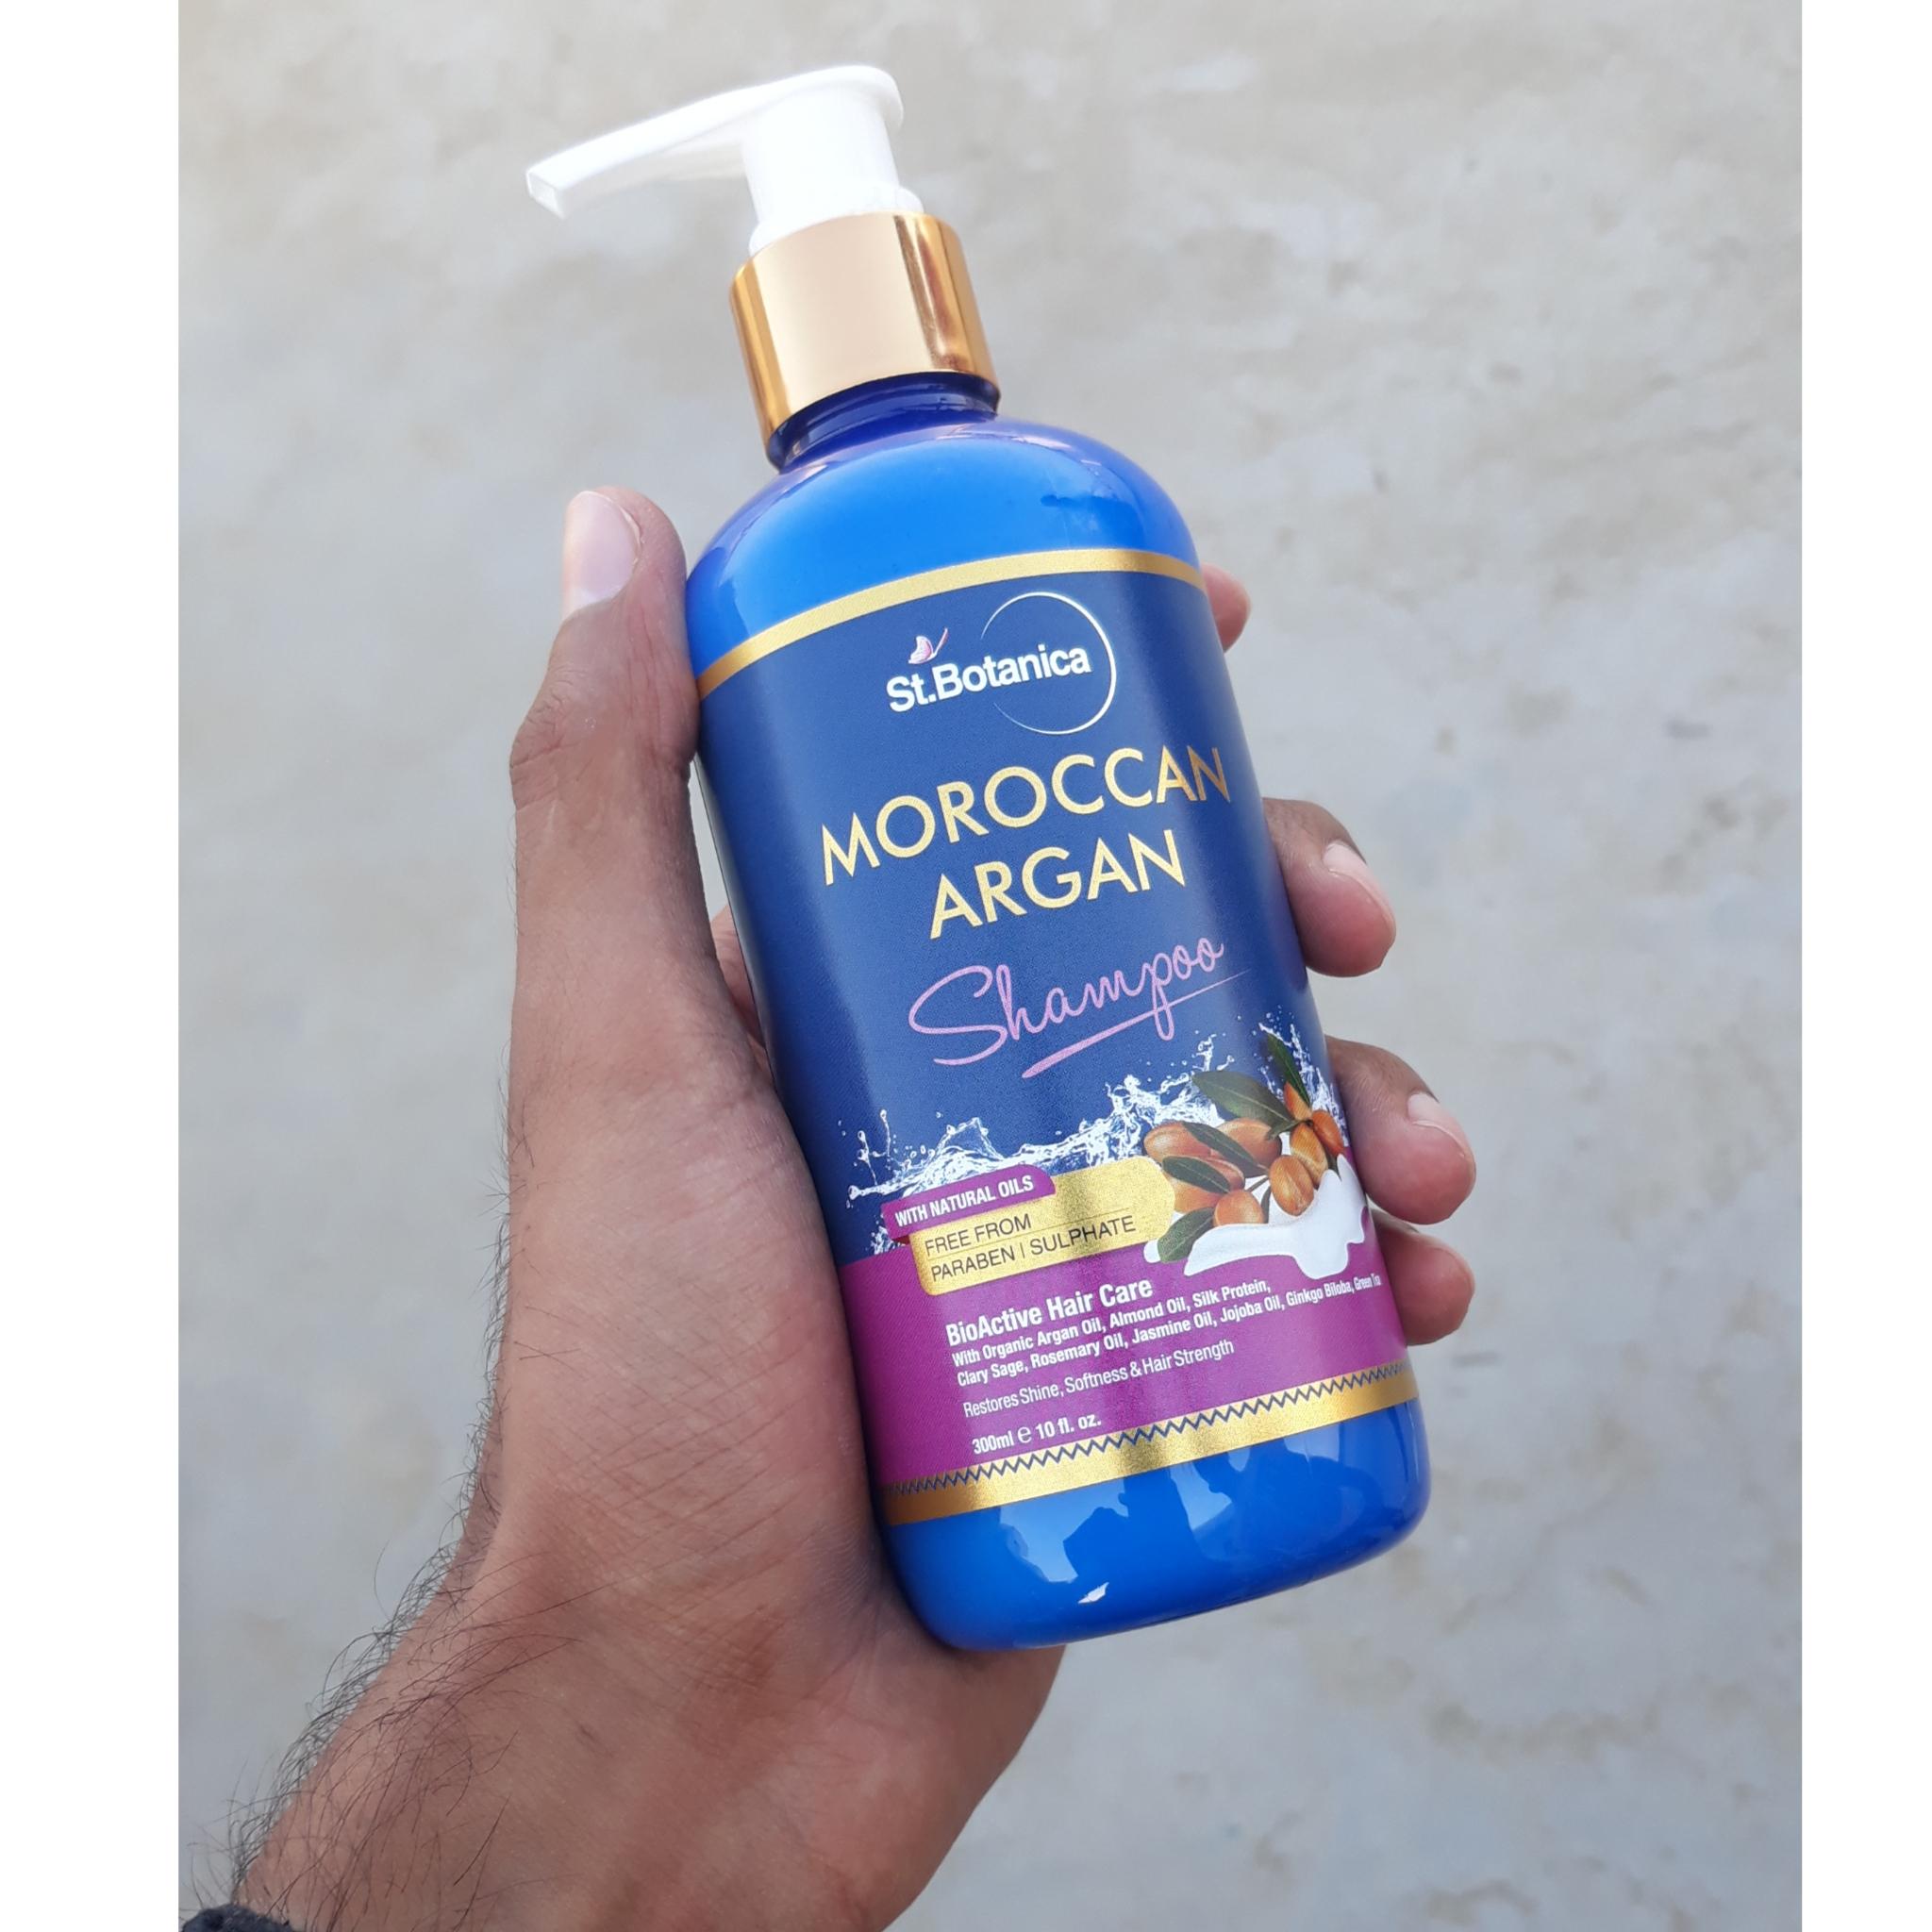 StBotanica Moroccan Argan Hair Shampoo-St.Botanica Moroccan argan hair shampoo-By bunny_khan-2